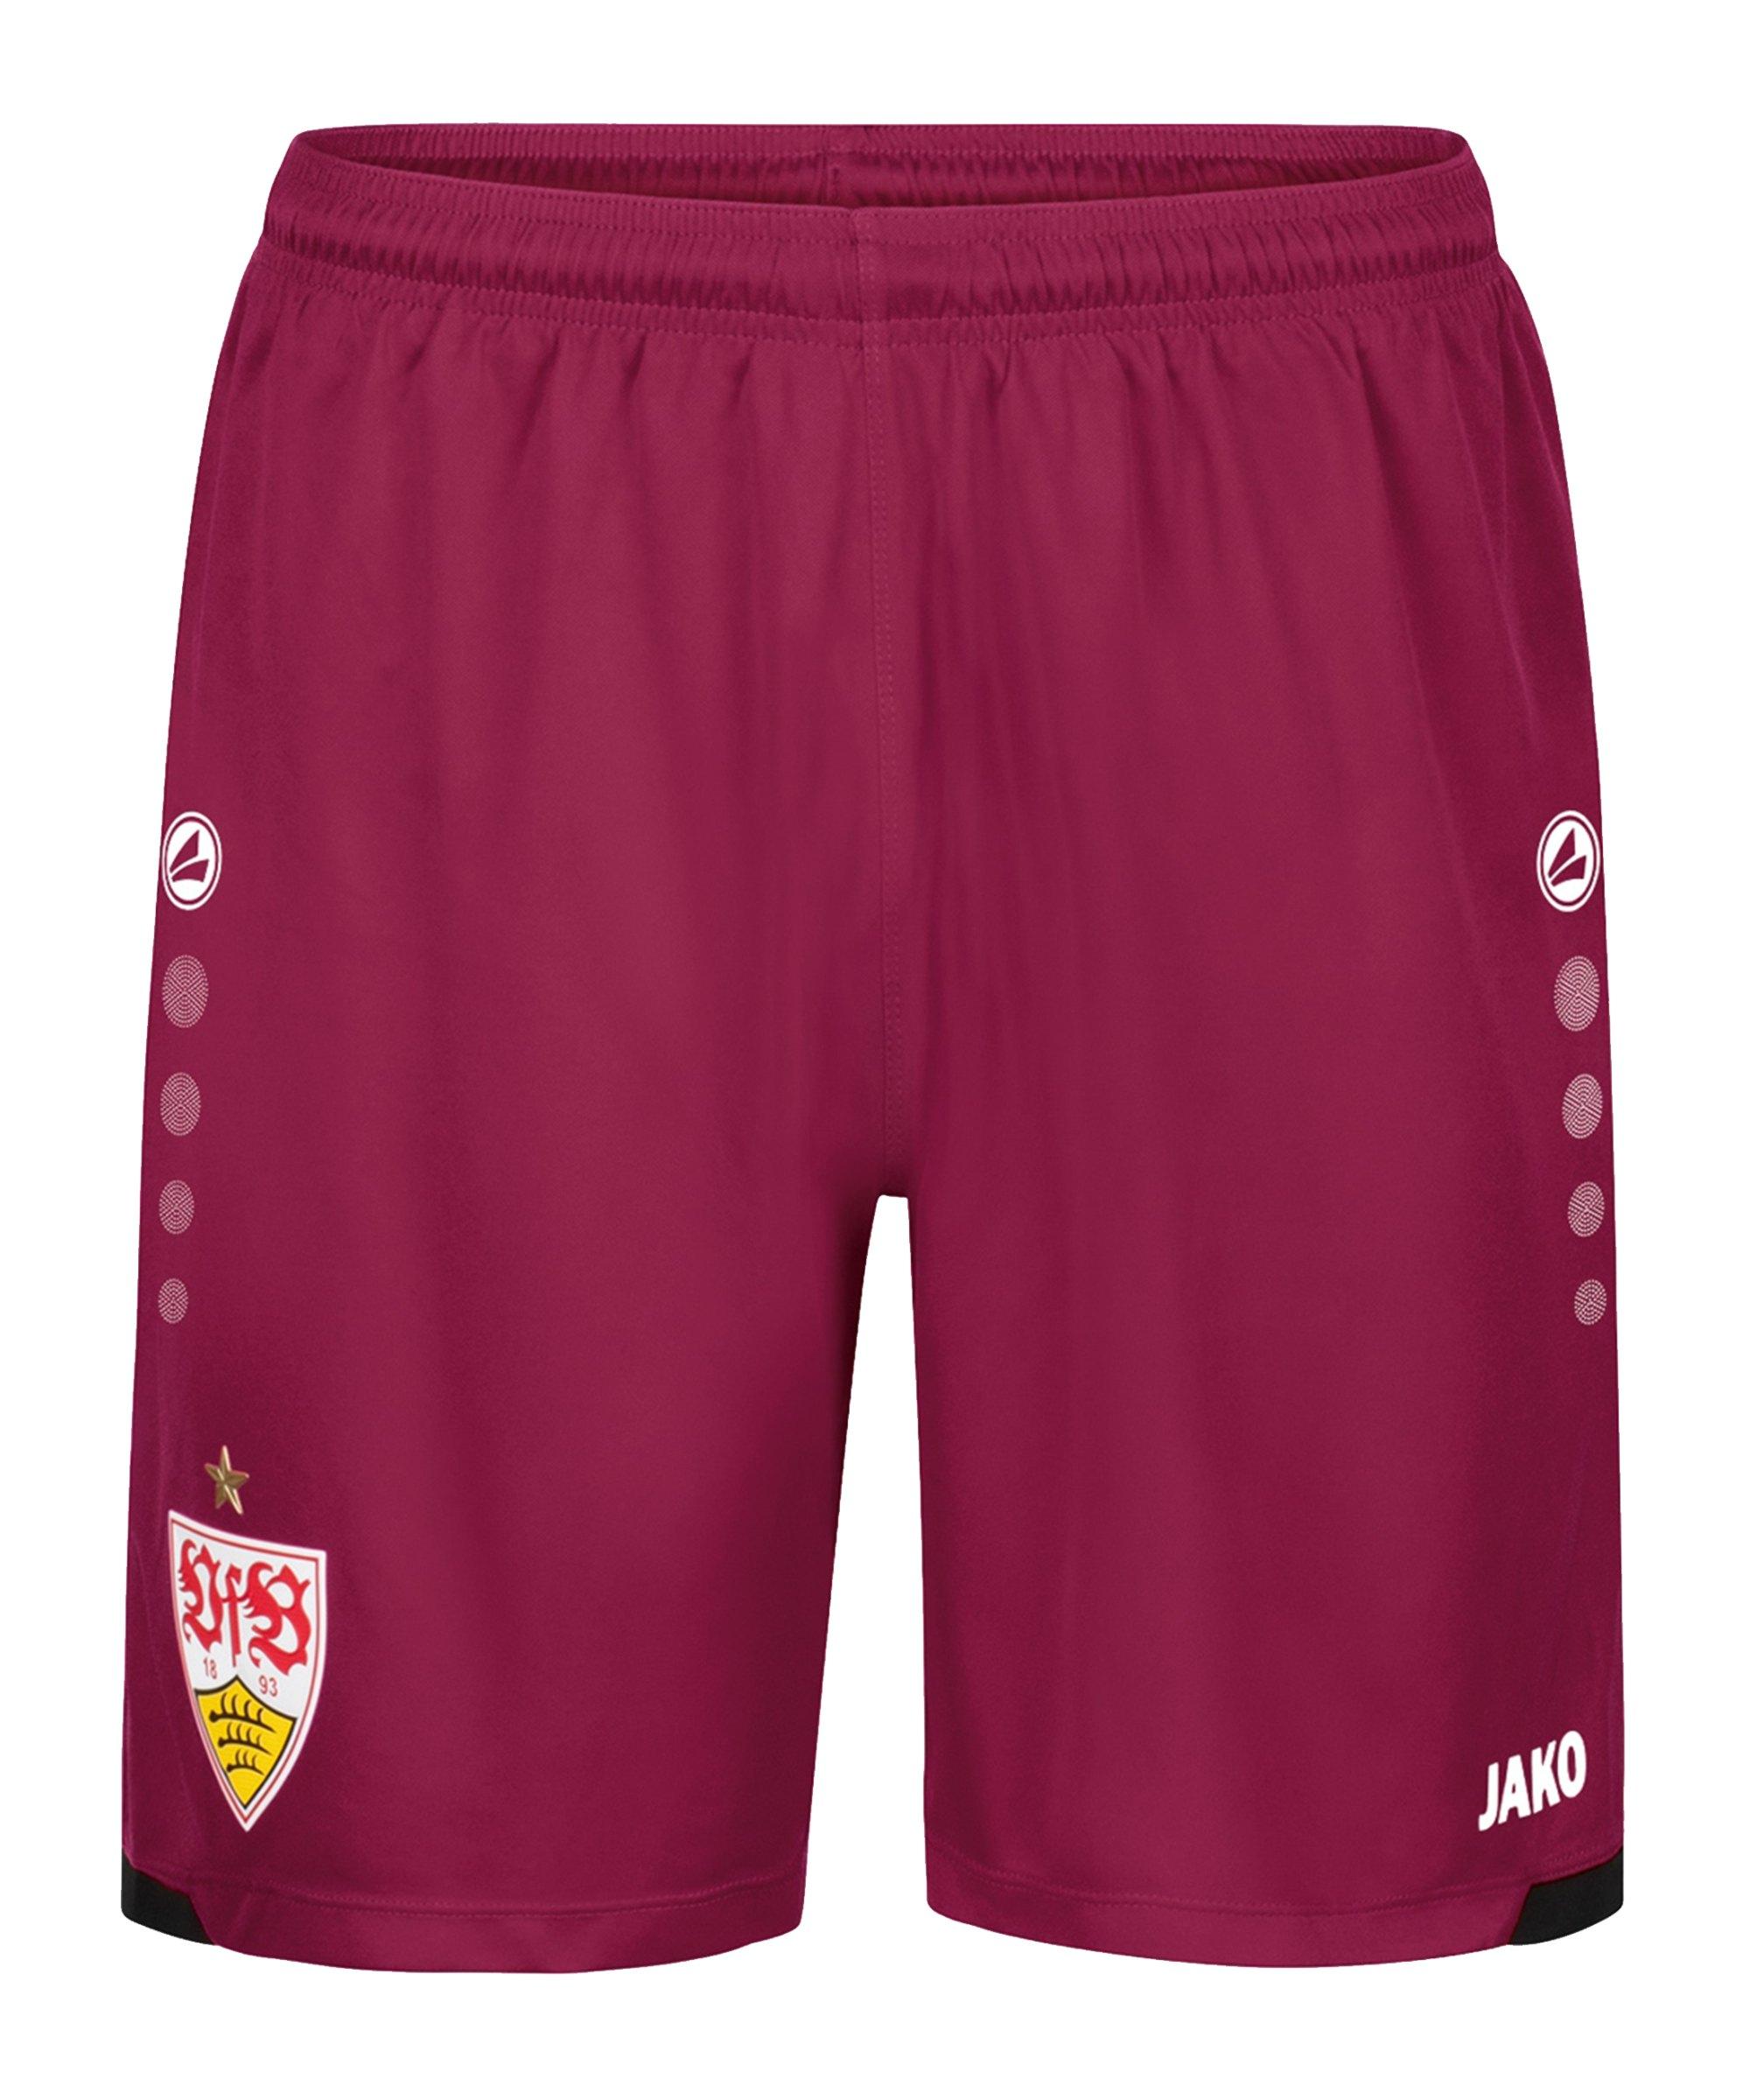 JAKO VfB Stuttgart TW-Short Away 2021/2022 Kids F612 - lila